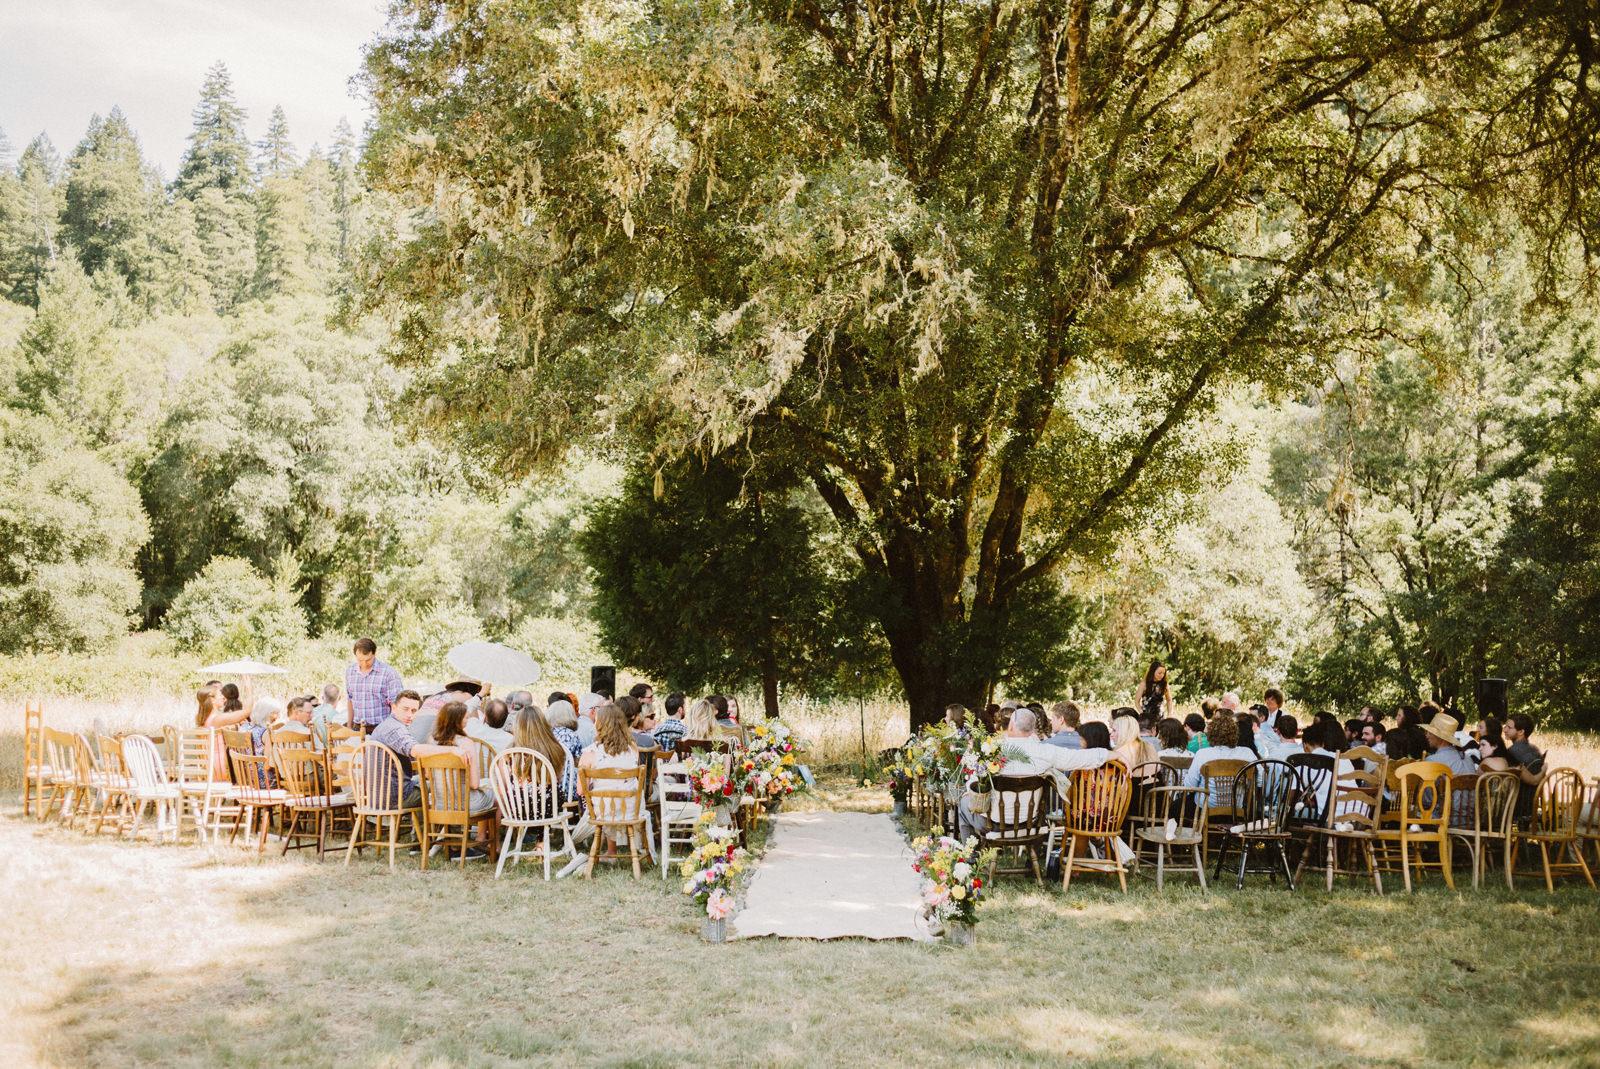 rivers-bend-retreat-wedding-013 RIVER'S BEND RETREAT WEDDING